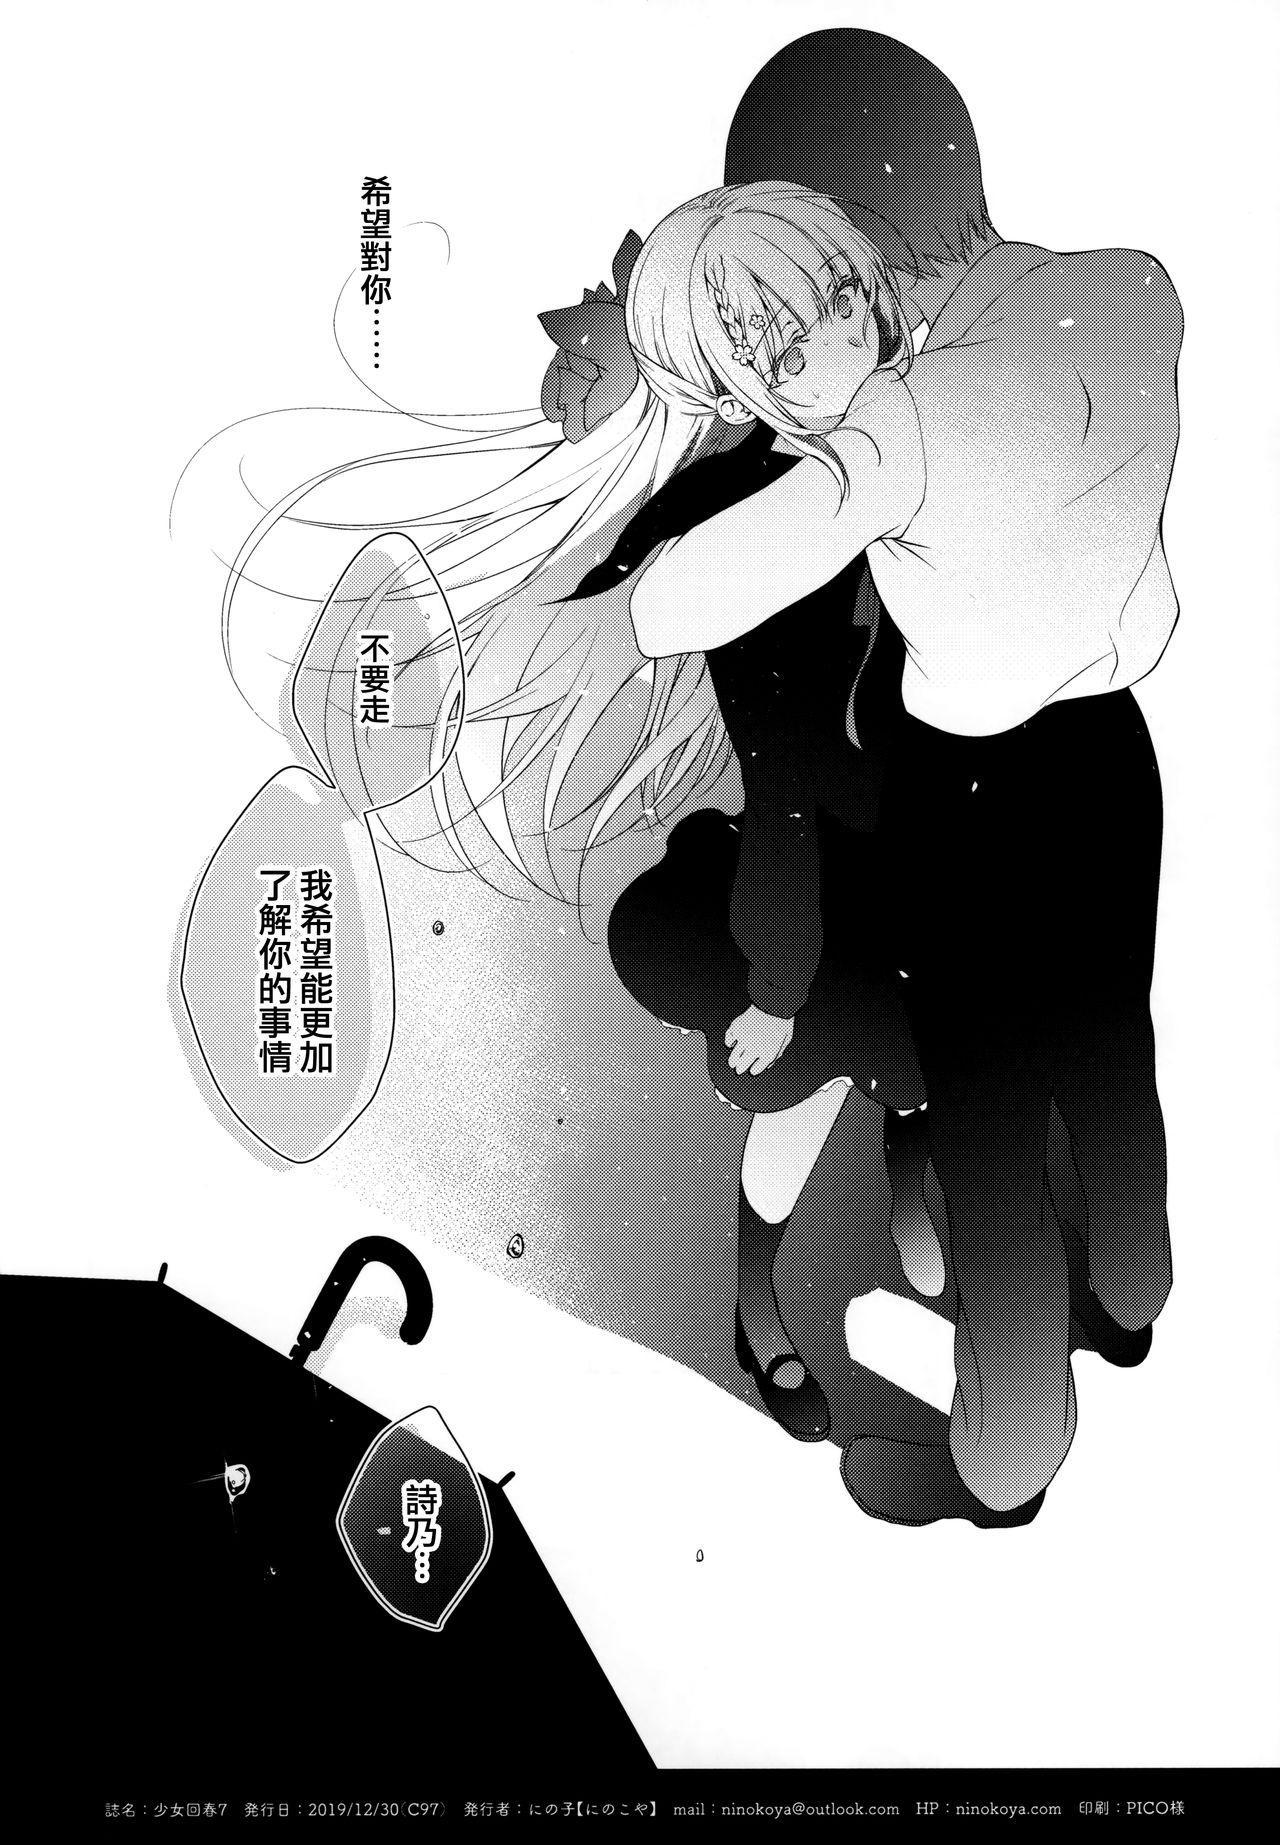 Shoujo Kaishun 7 + Ninokoya C97 Melonbooks Omakebon 39